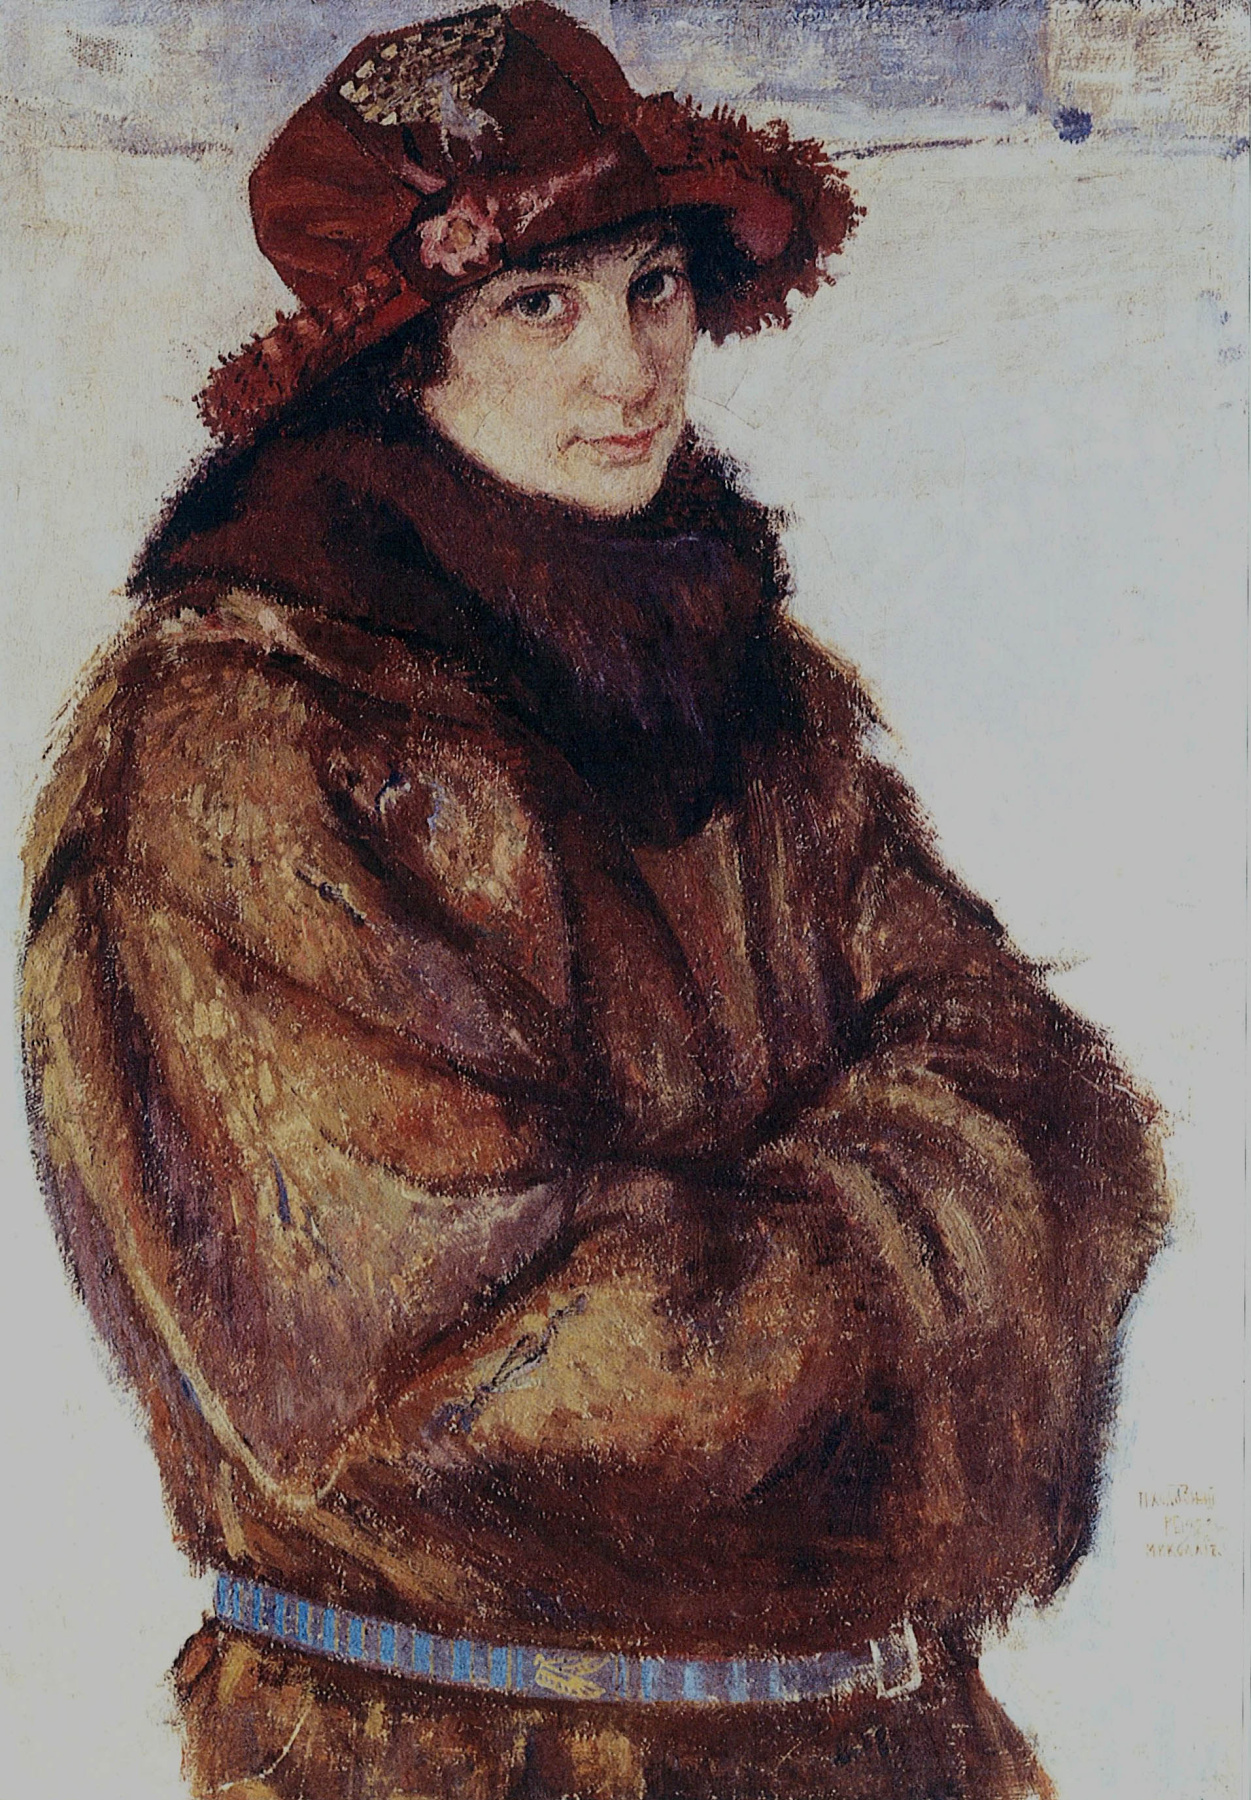 Peter Ivanovich Cold. Portrait of Stefanicheva